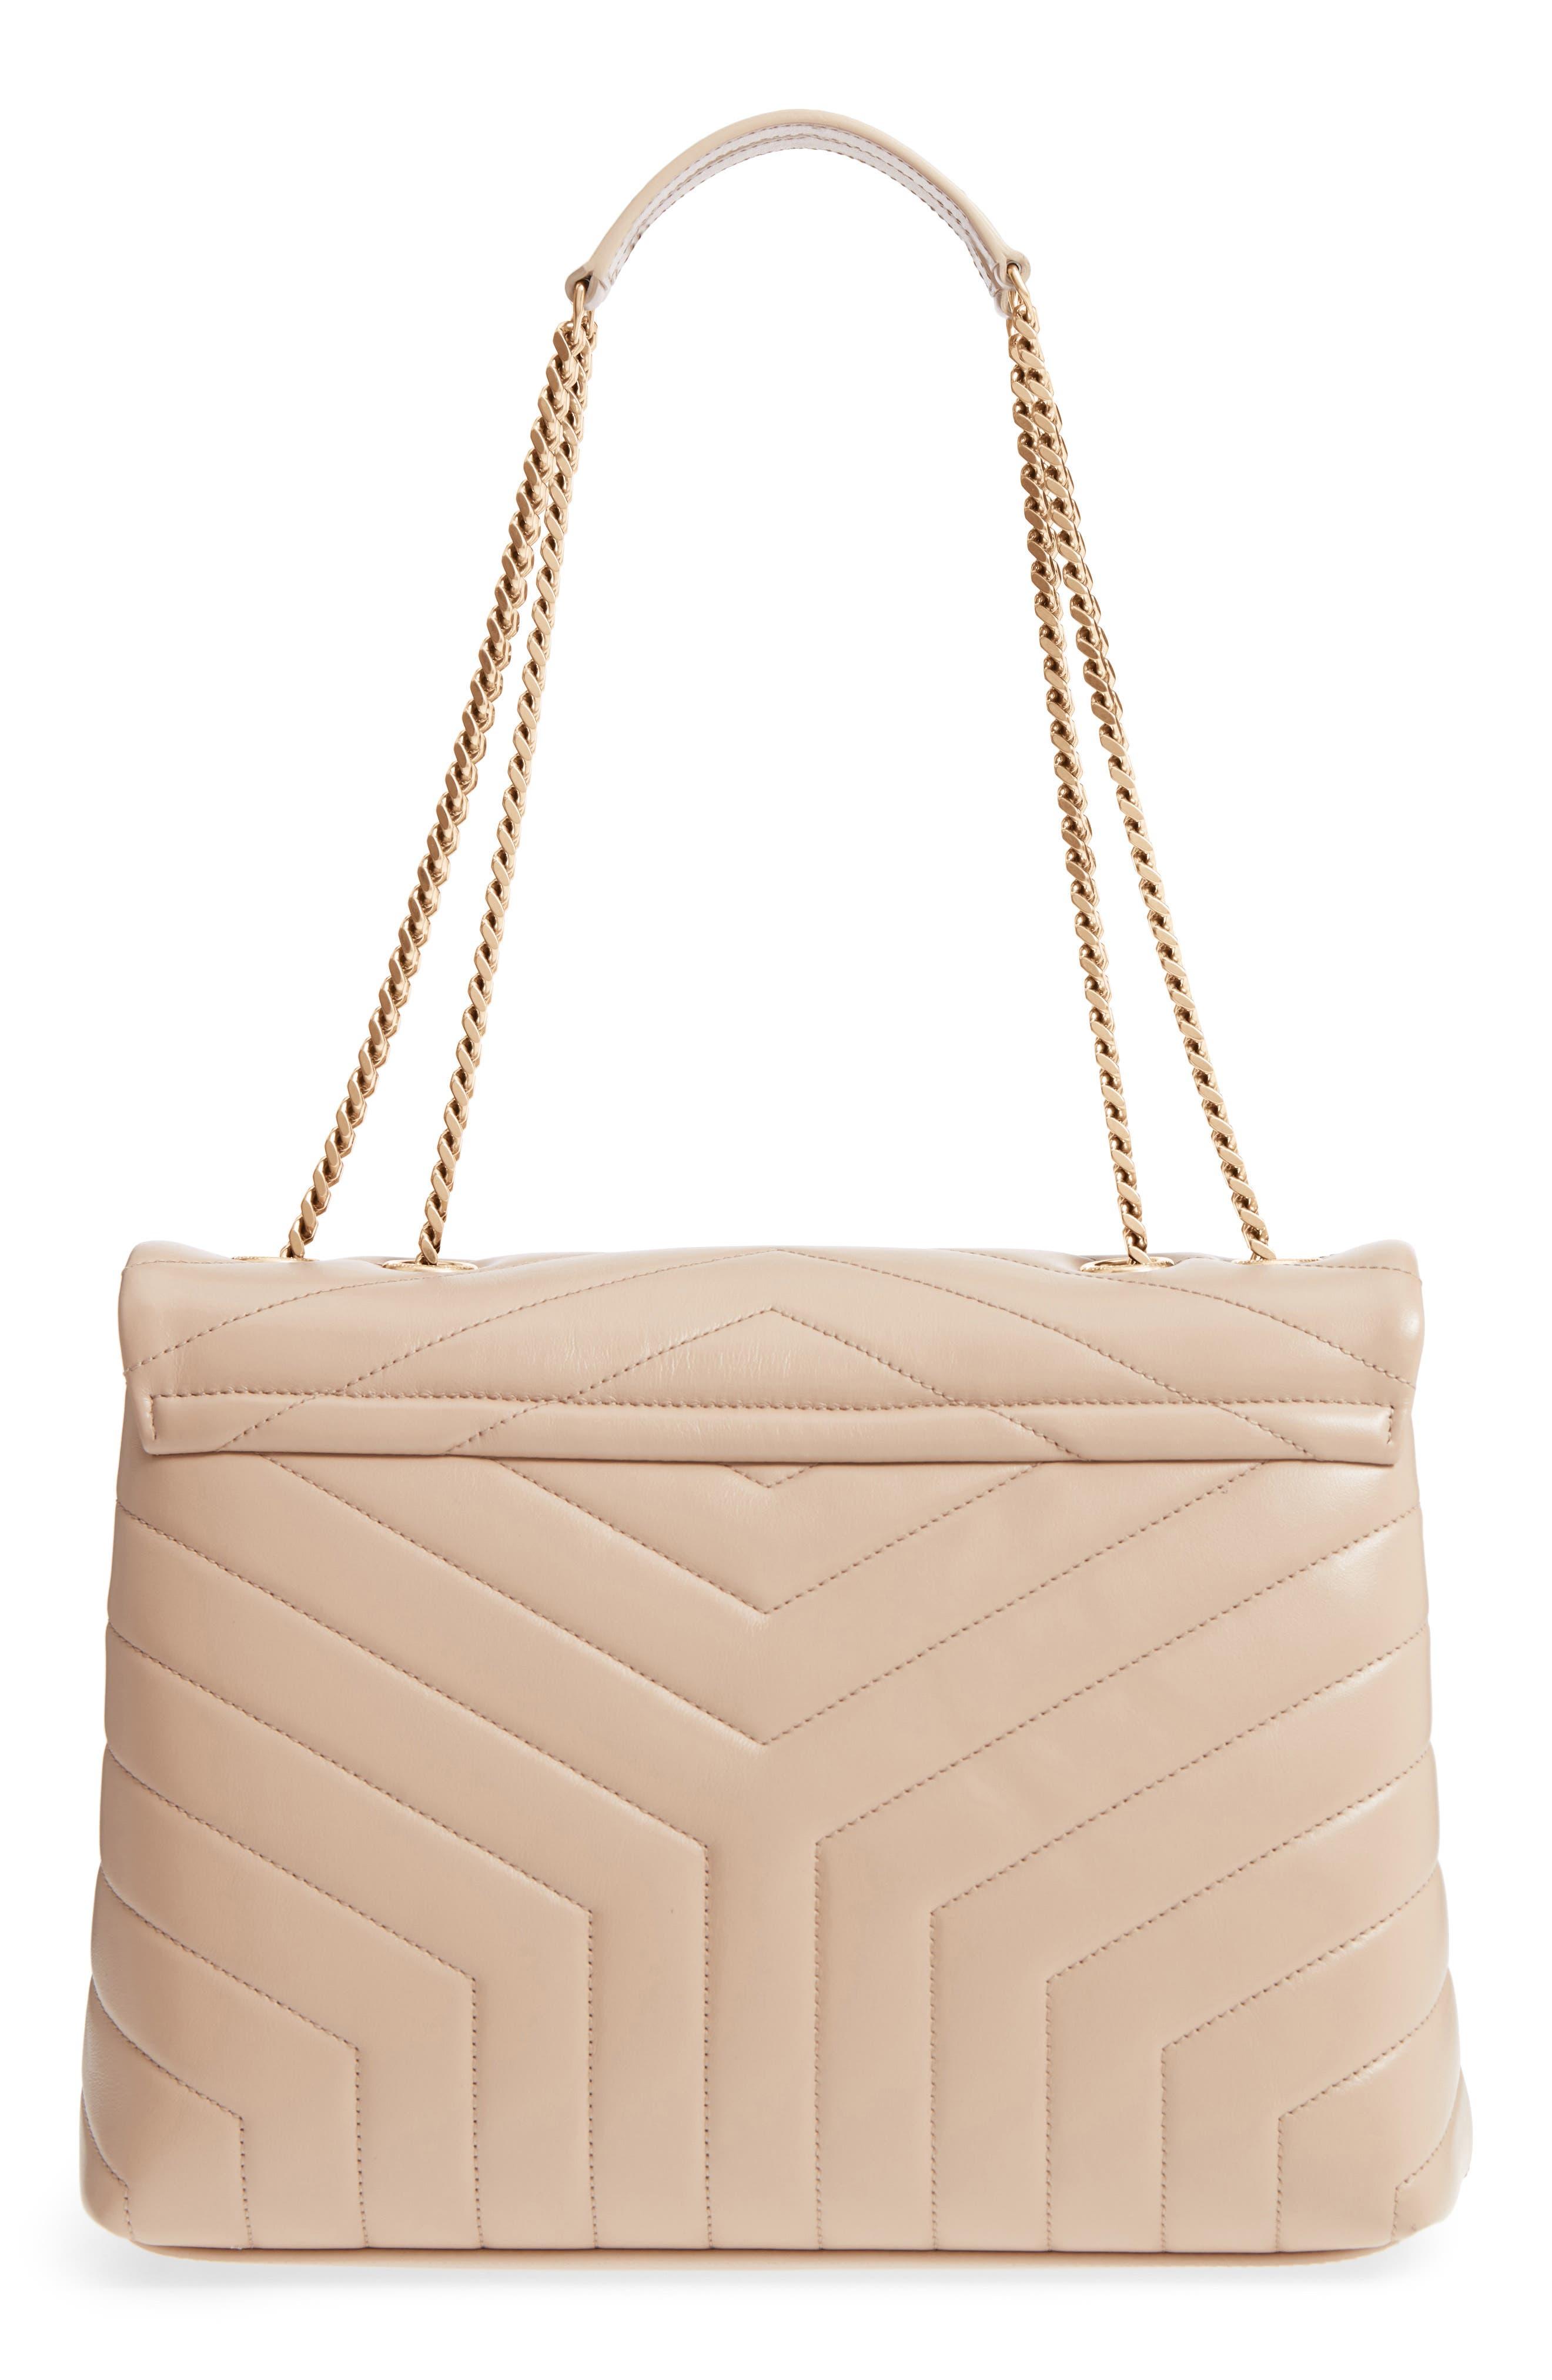 Medium Loulou Matelassé Calfskin Leather Shoulder Bag,                             Alternate thumbnail 3, color,                             LIGHT NATURAL